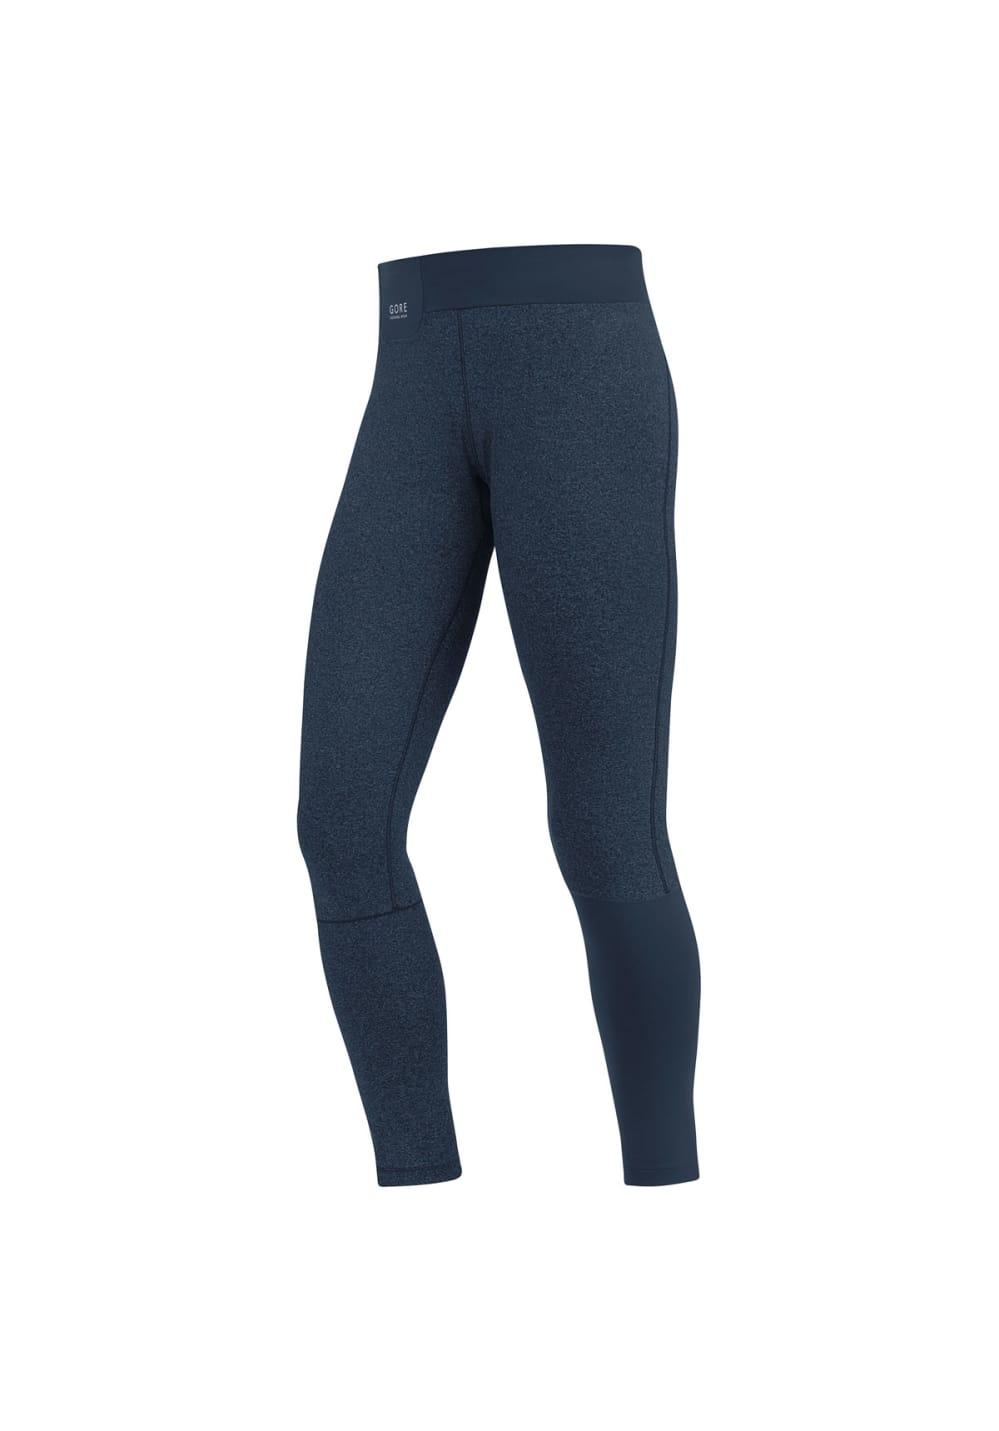 Running Bleu Pantalons Wear® Pantalon Sunlight Femme Thermo Course Gore Pour fb6g7y